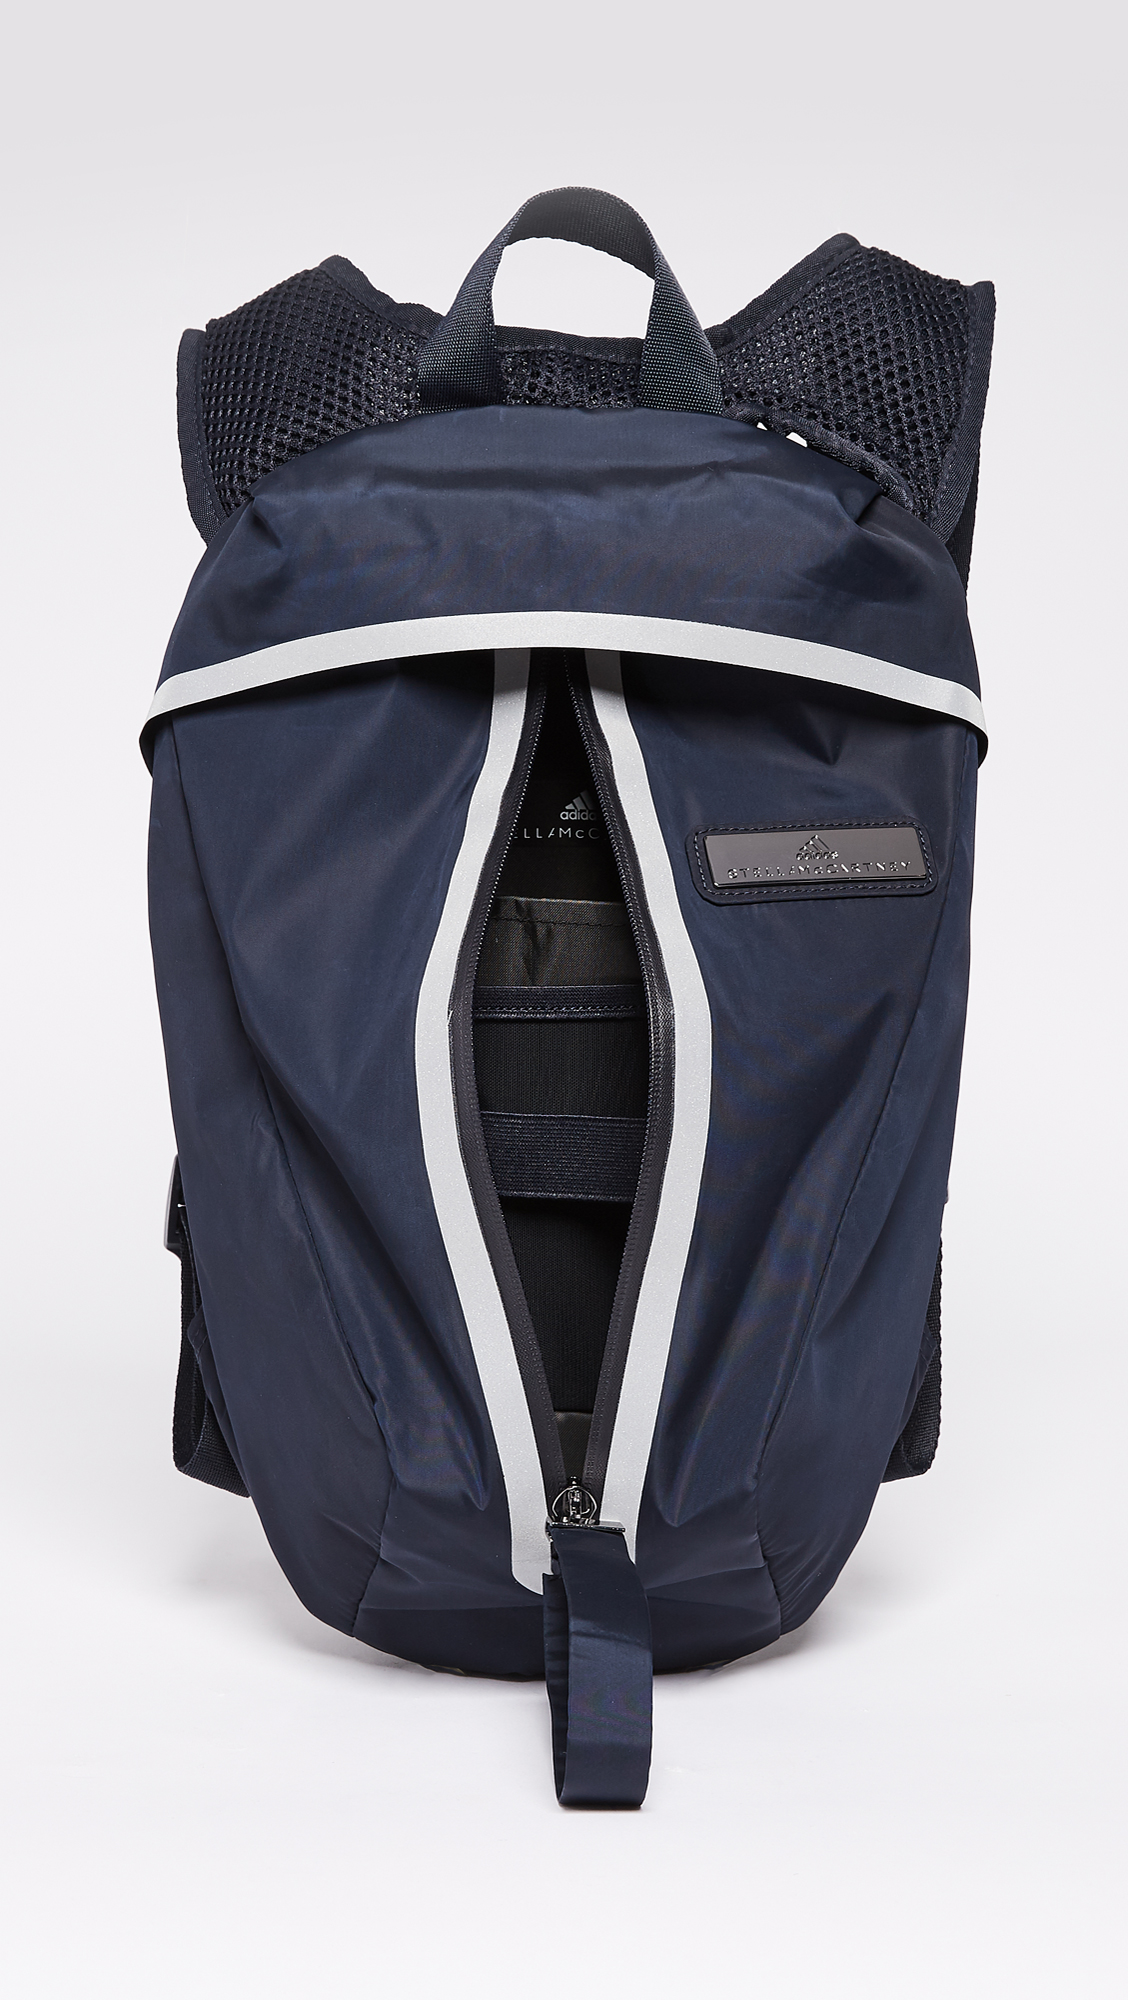 7a1e5a8e4e8f8 Adidas Stellasport Rucksack